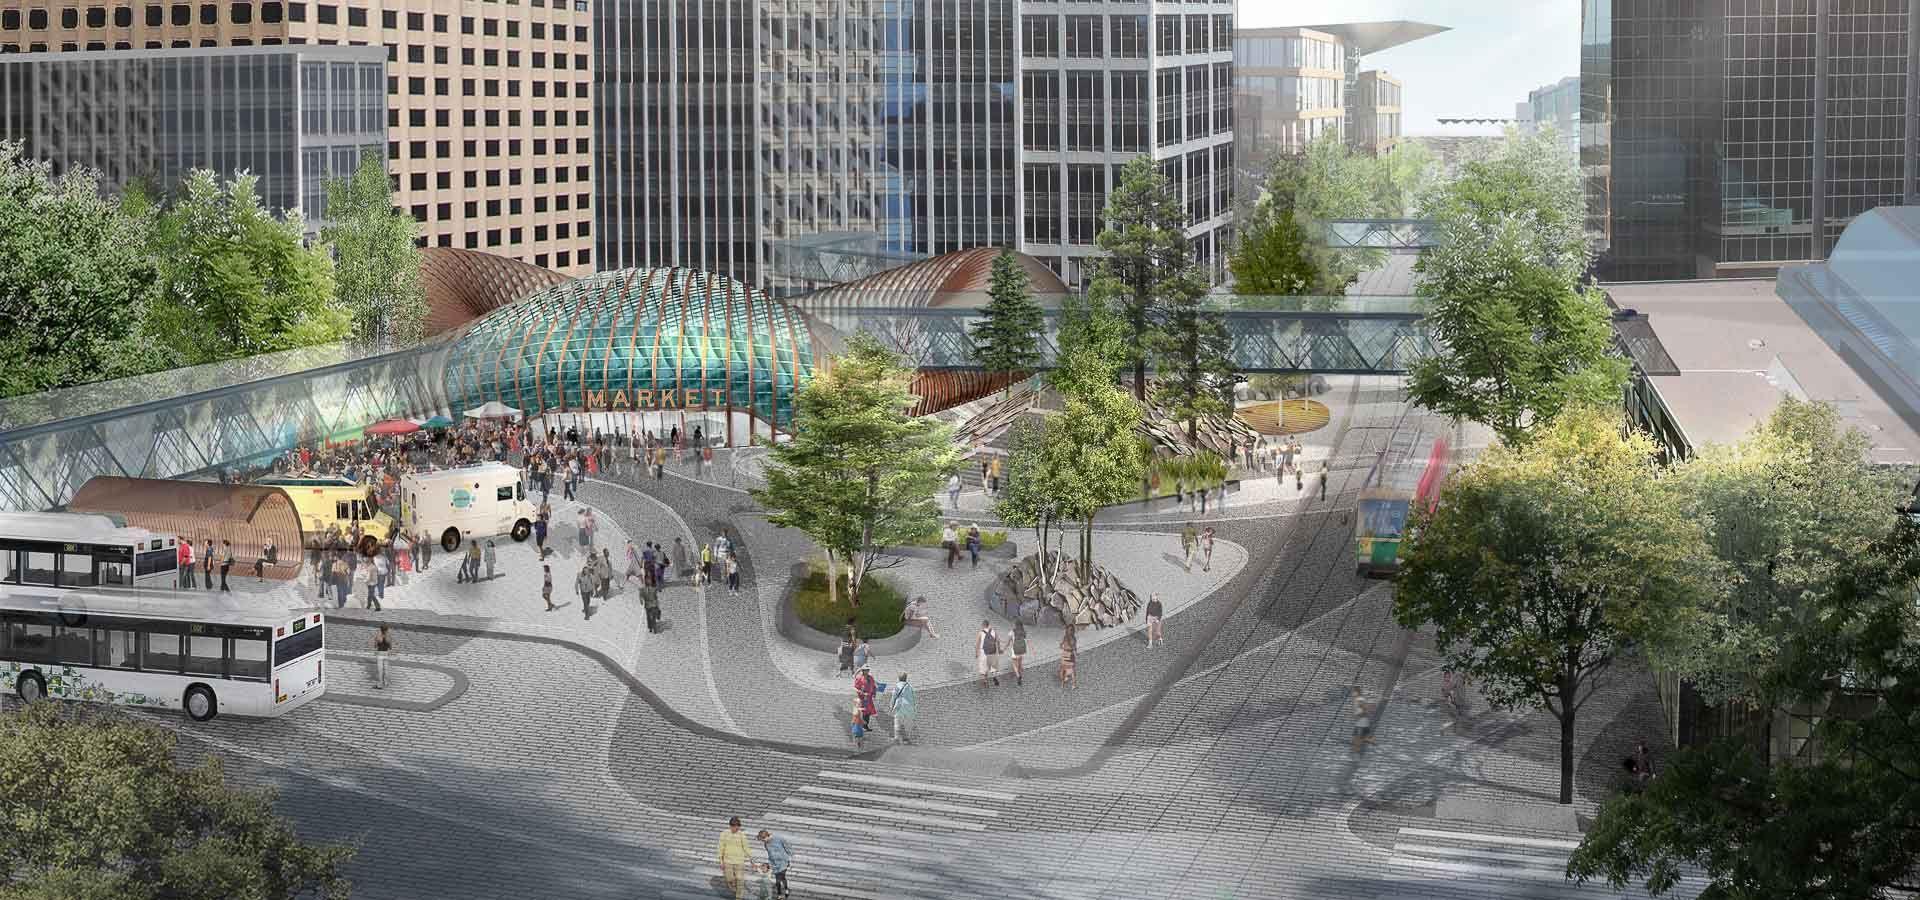 Design Landscape Architecture Architecture Planning